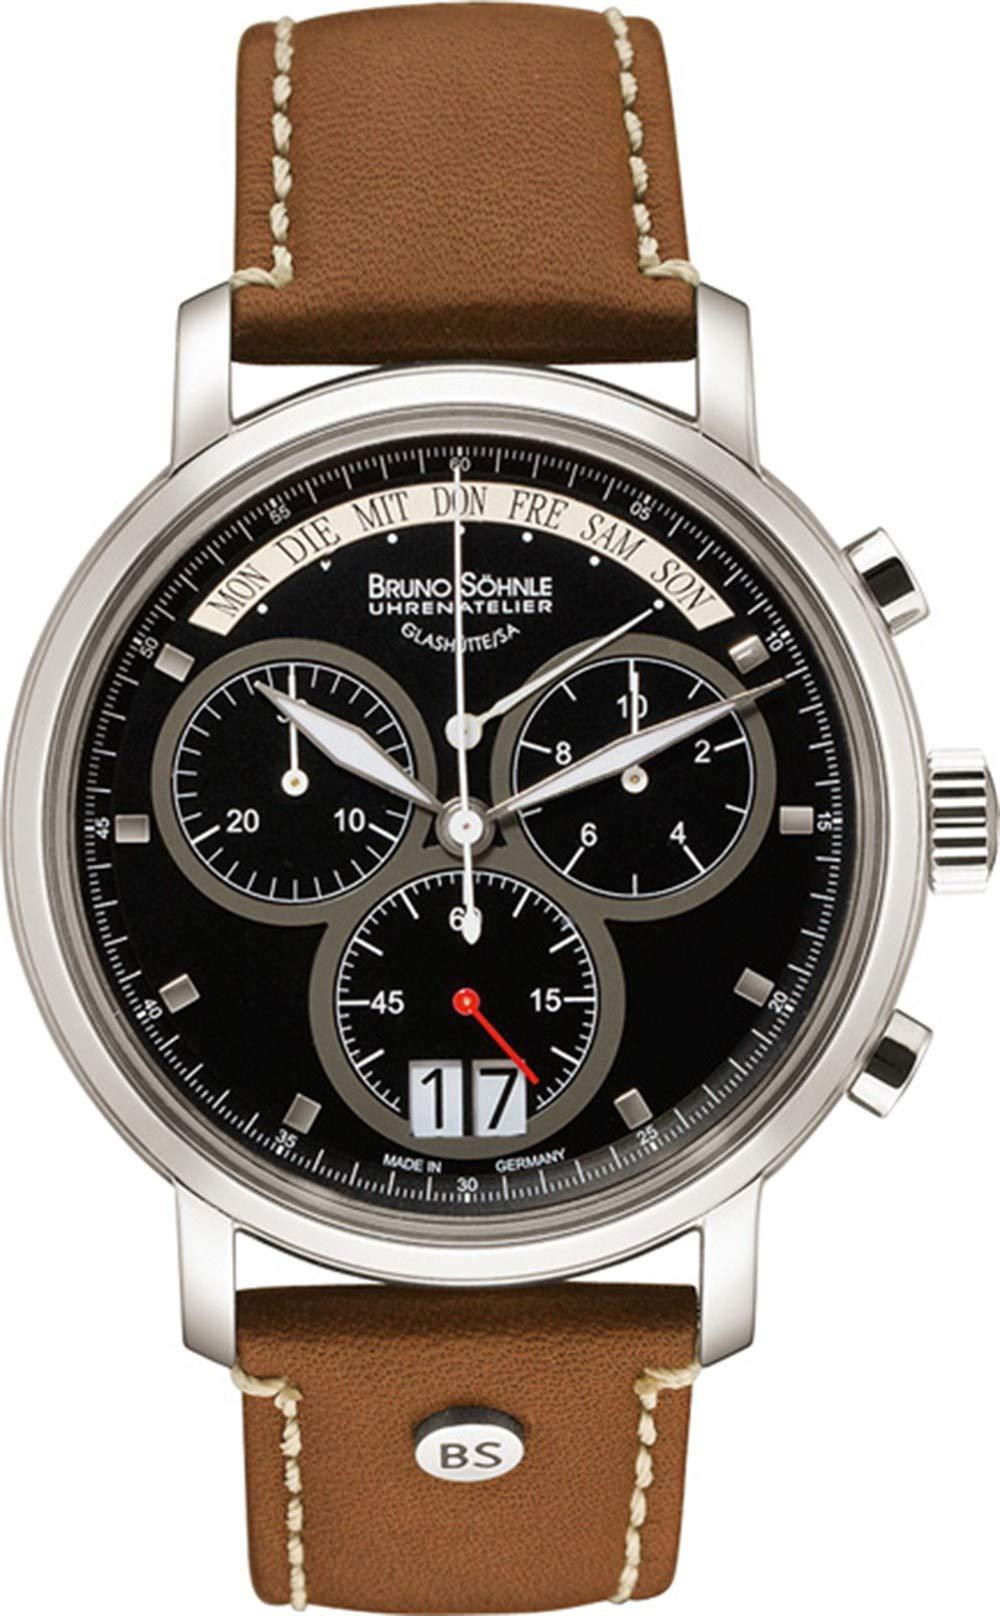 Herren Chronograph Quarz Uhr mit Leder Armband 17-13143-841